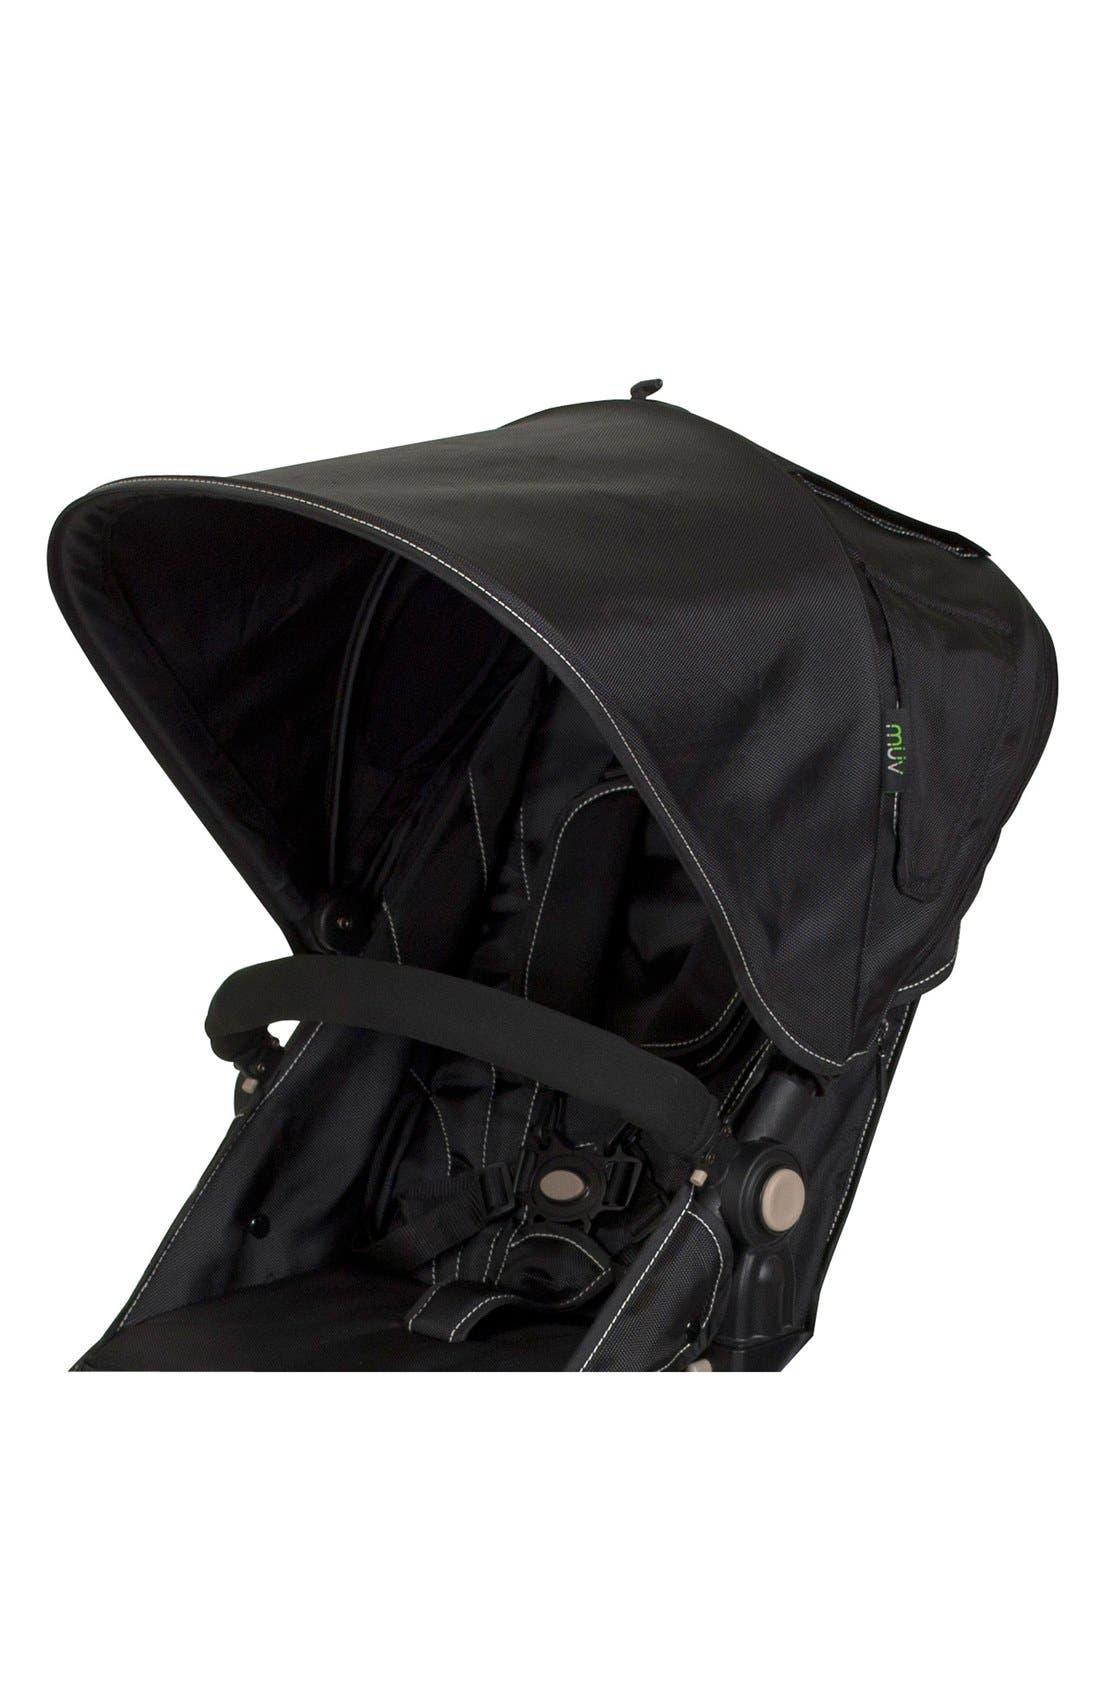 Muv KOEPEL Stroller Canopy